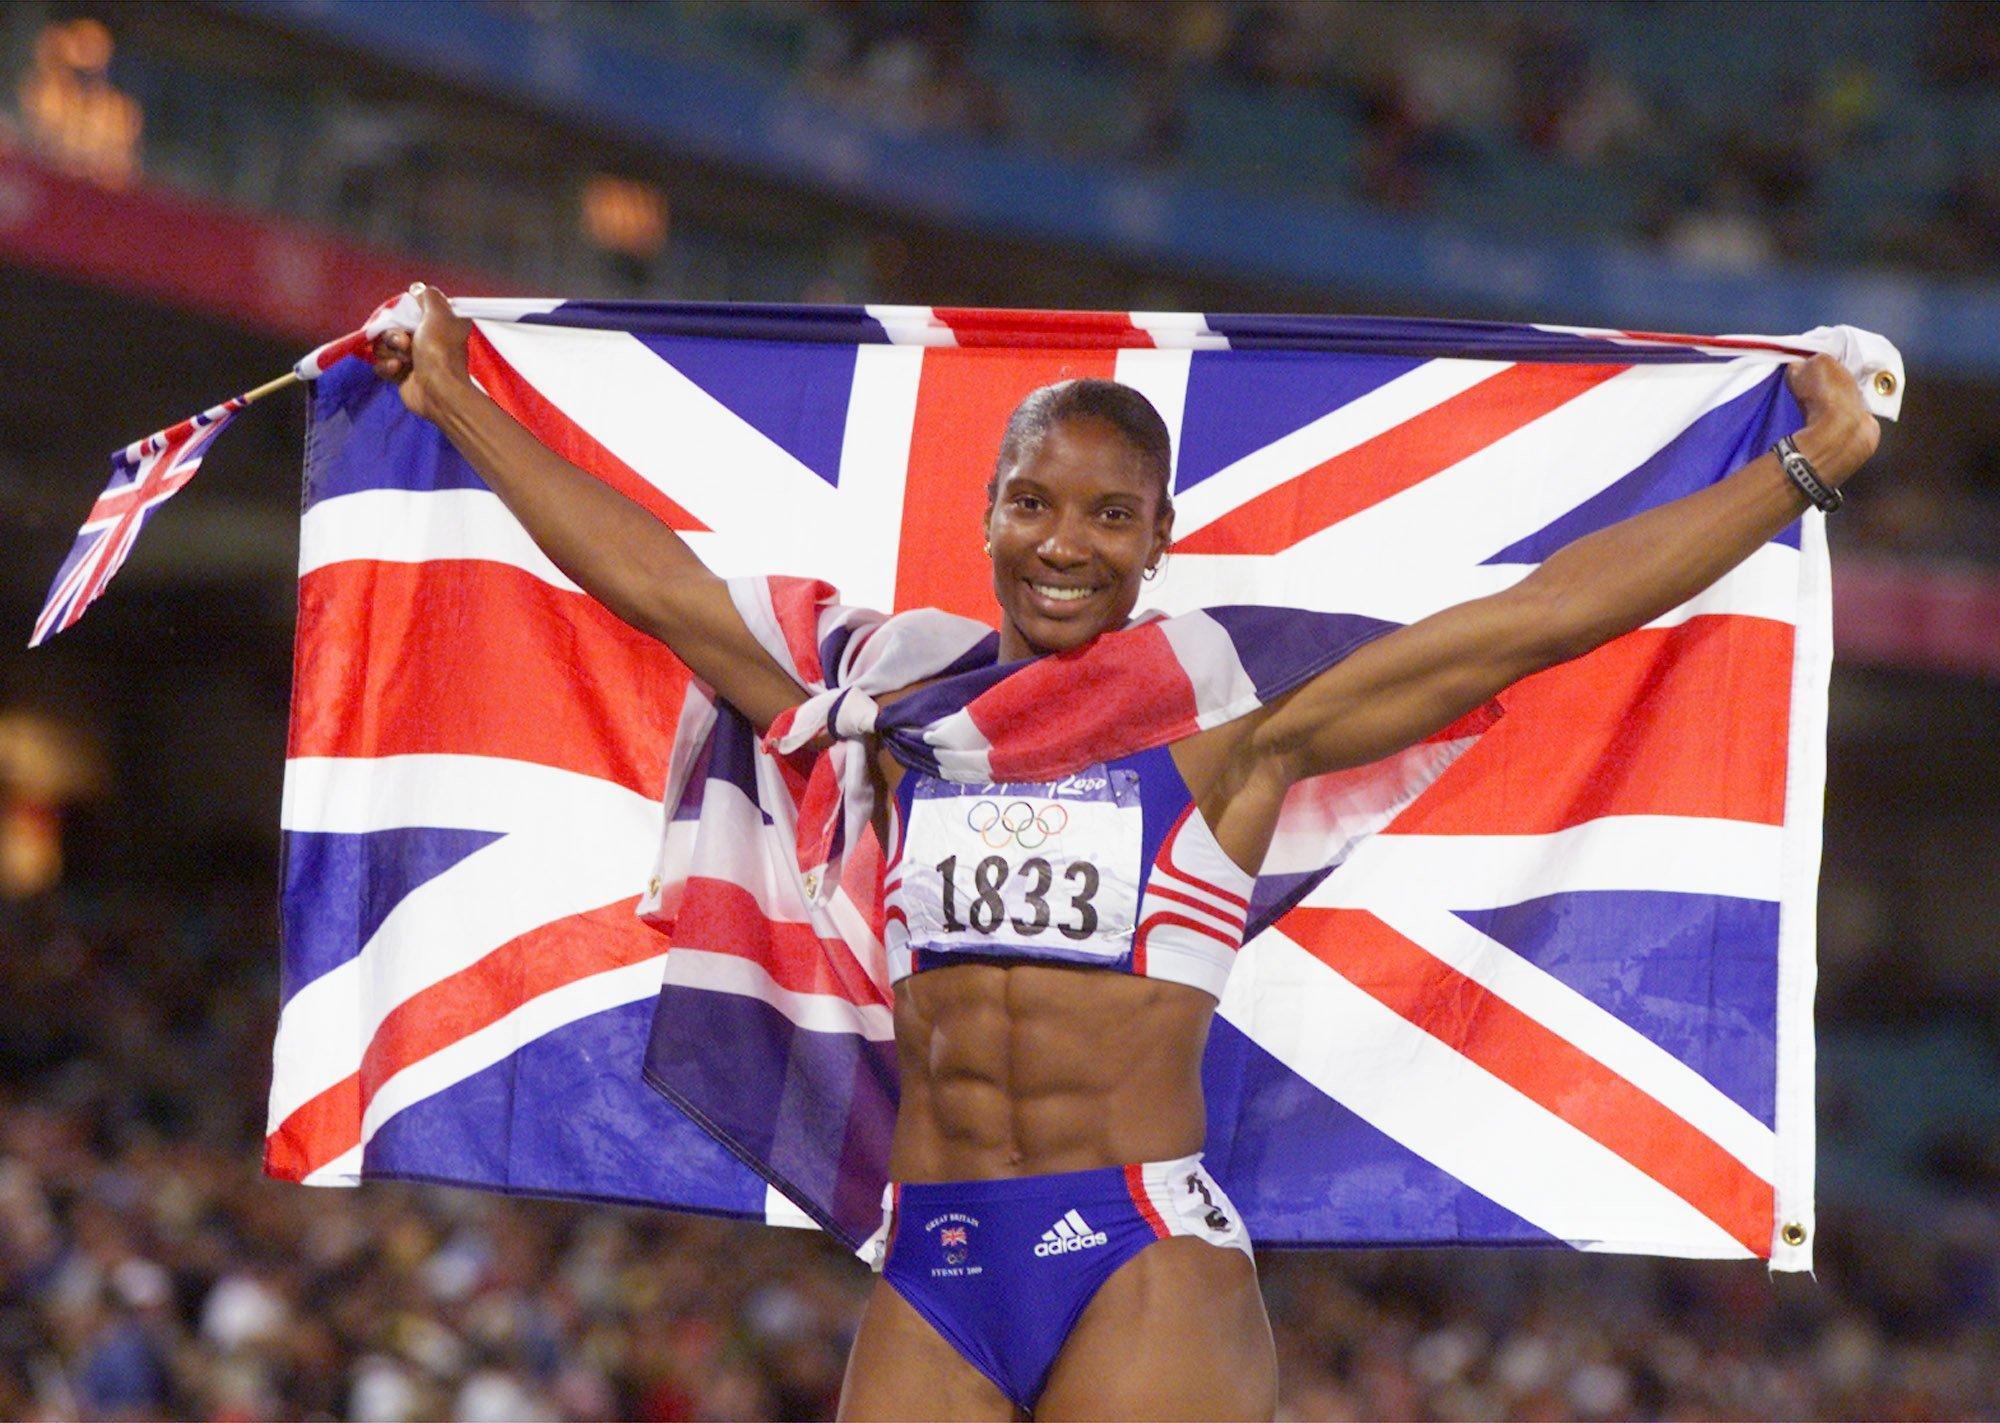 Denise Lewis won heptathlon gold at the 2000 Olympics in Sydney